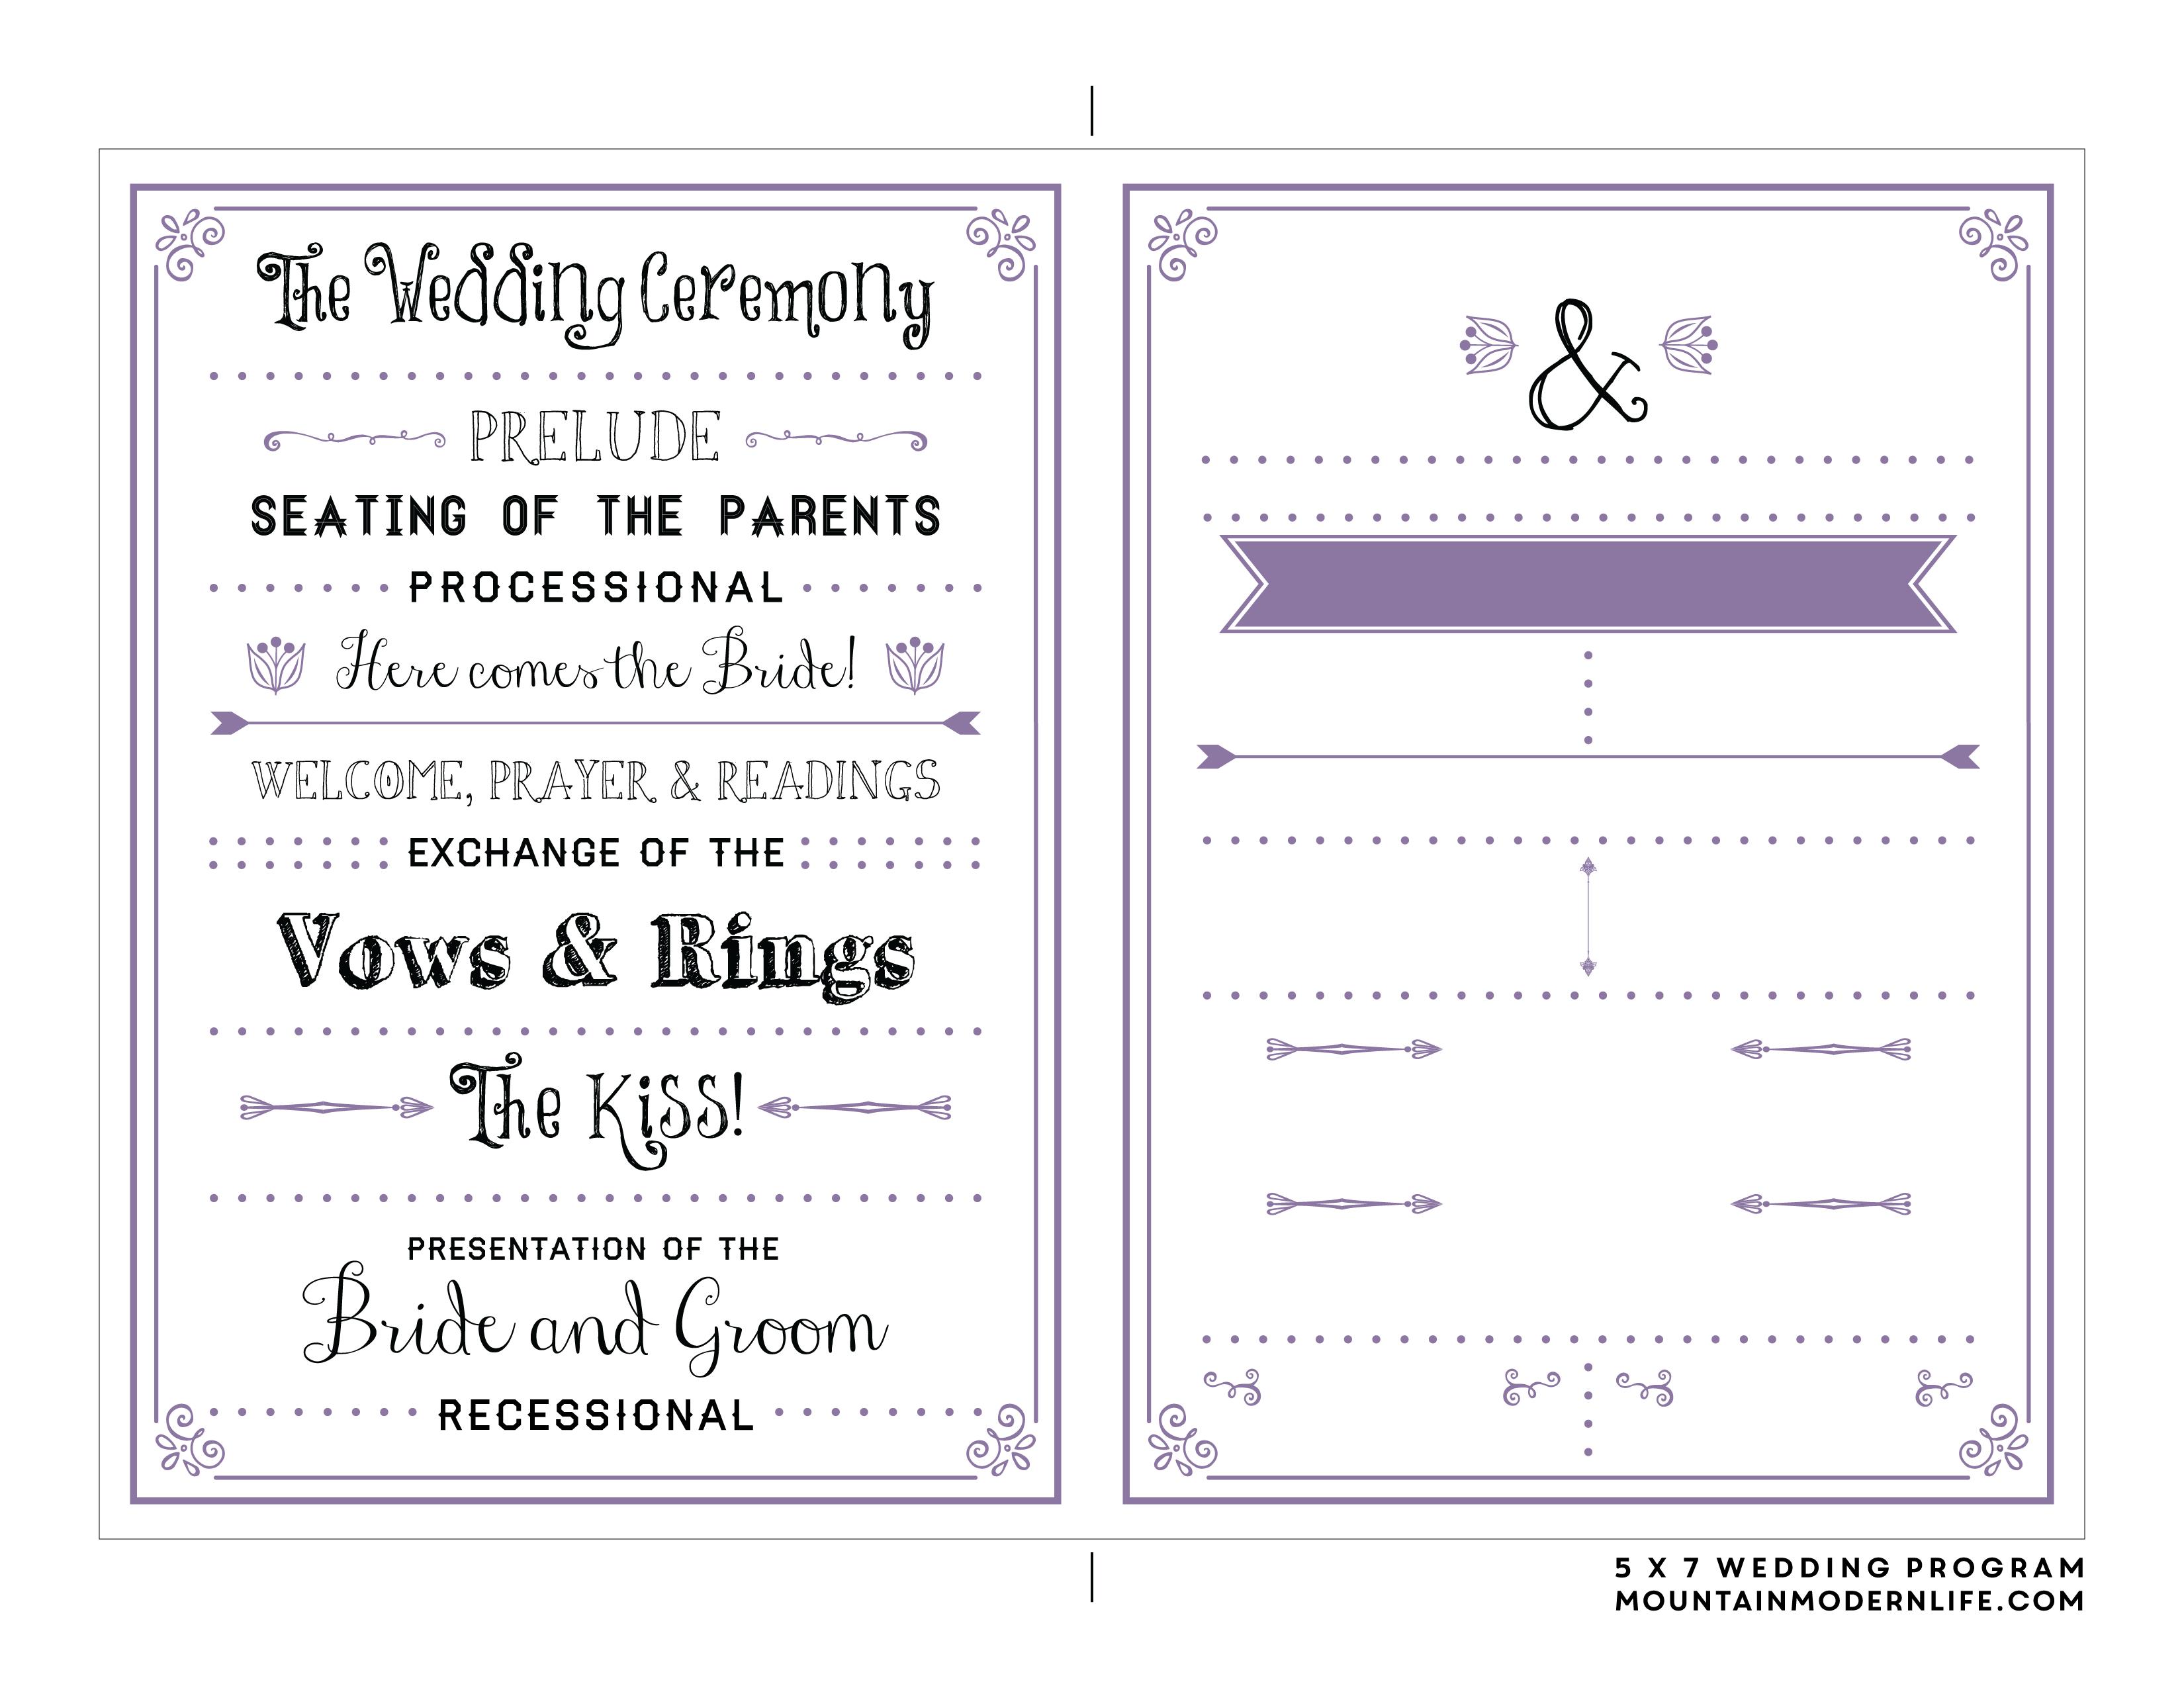 Free Printable Wedding Program | Mountainmodernlife - Free Printable Wedding Fan Templates